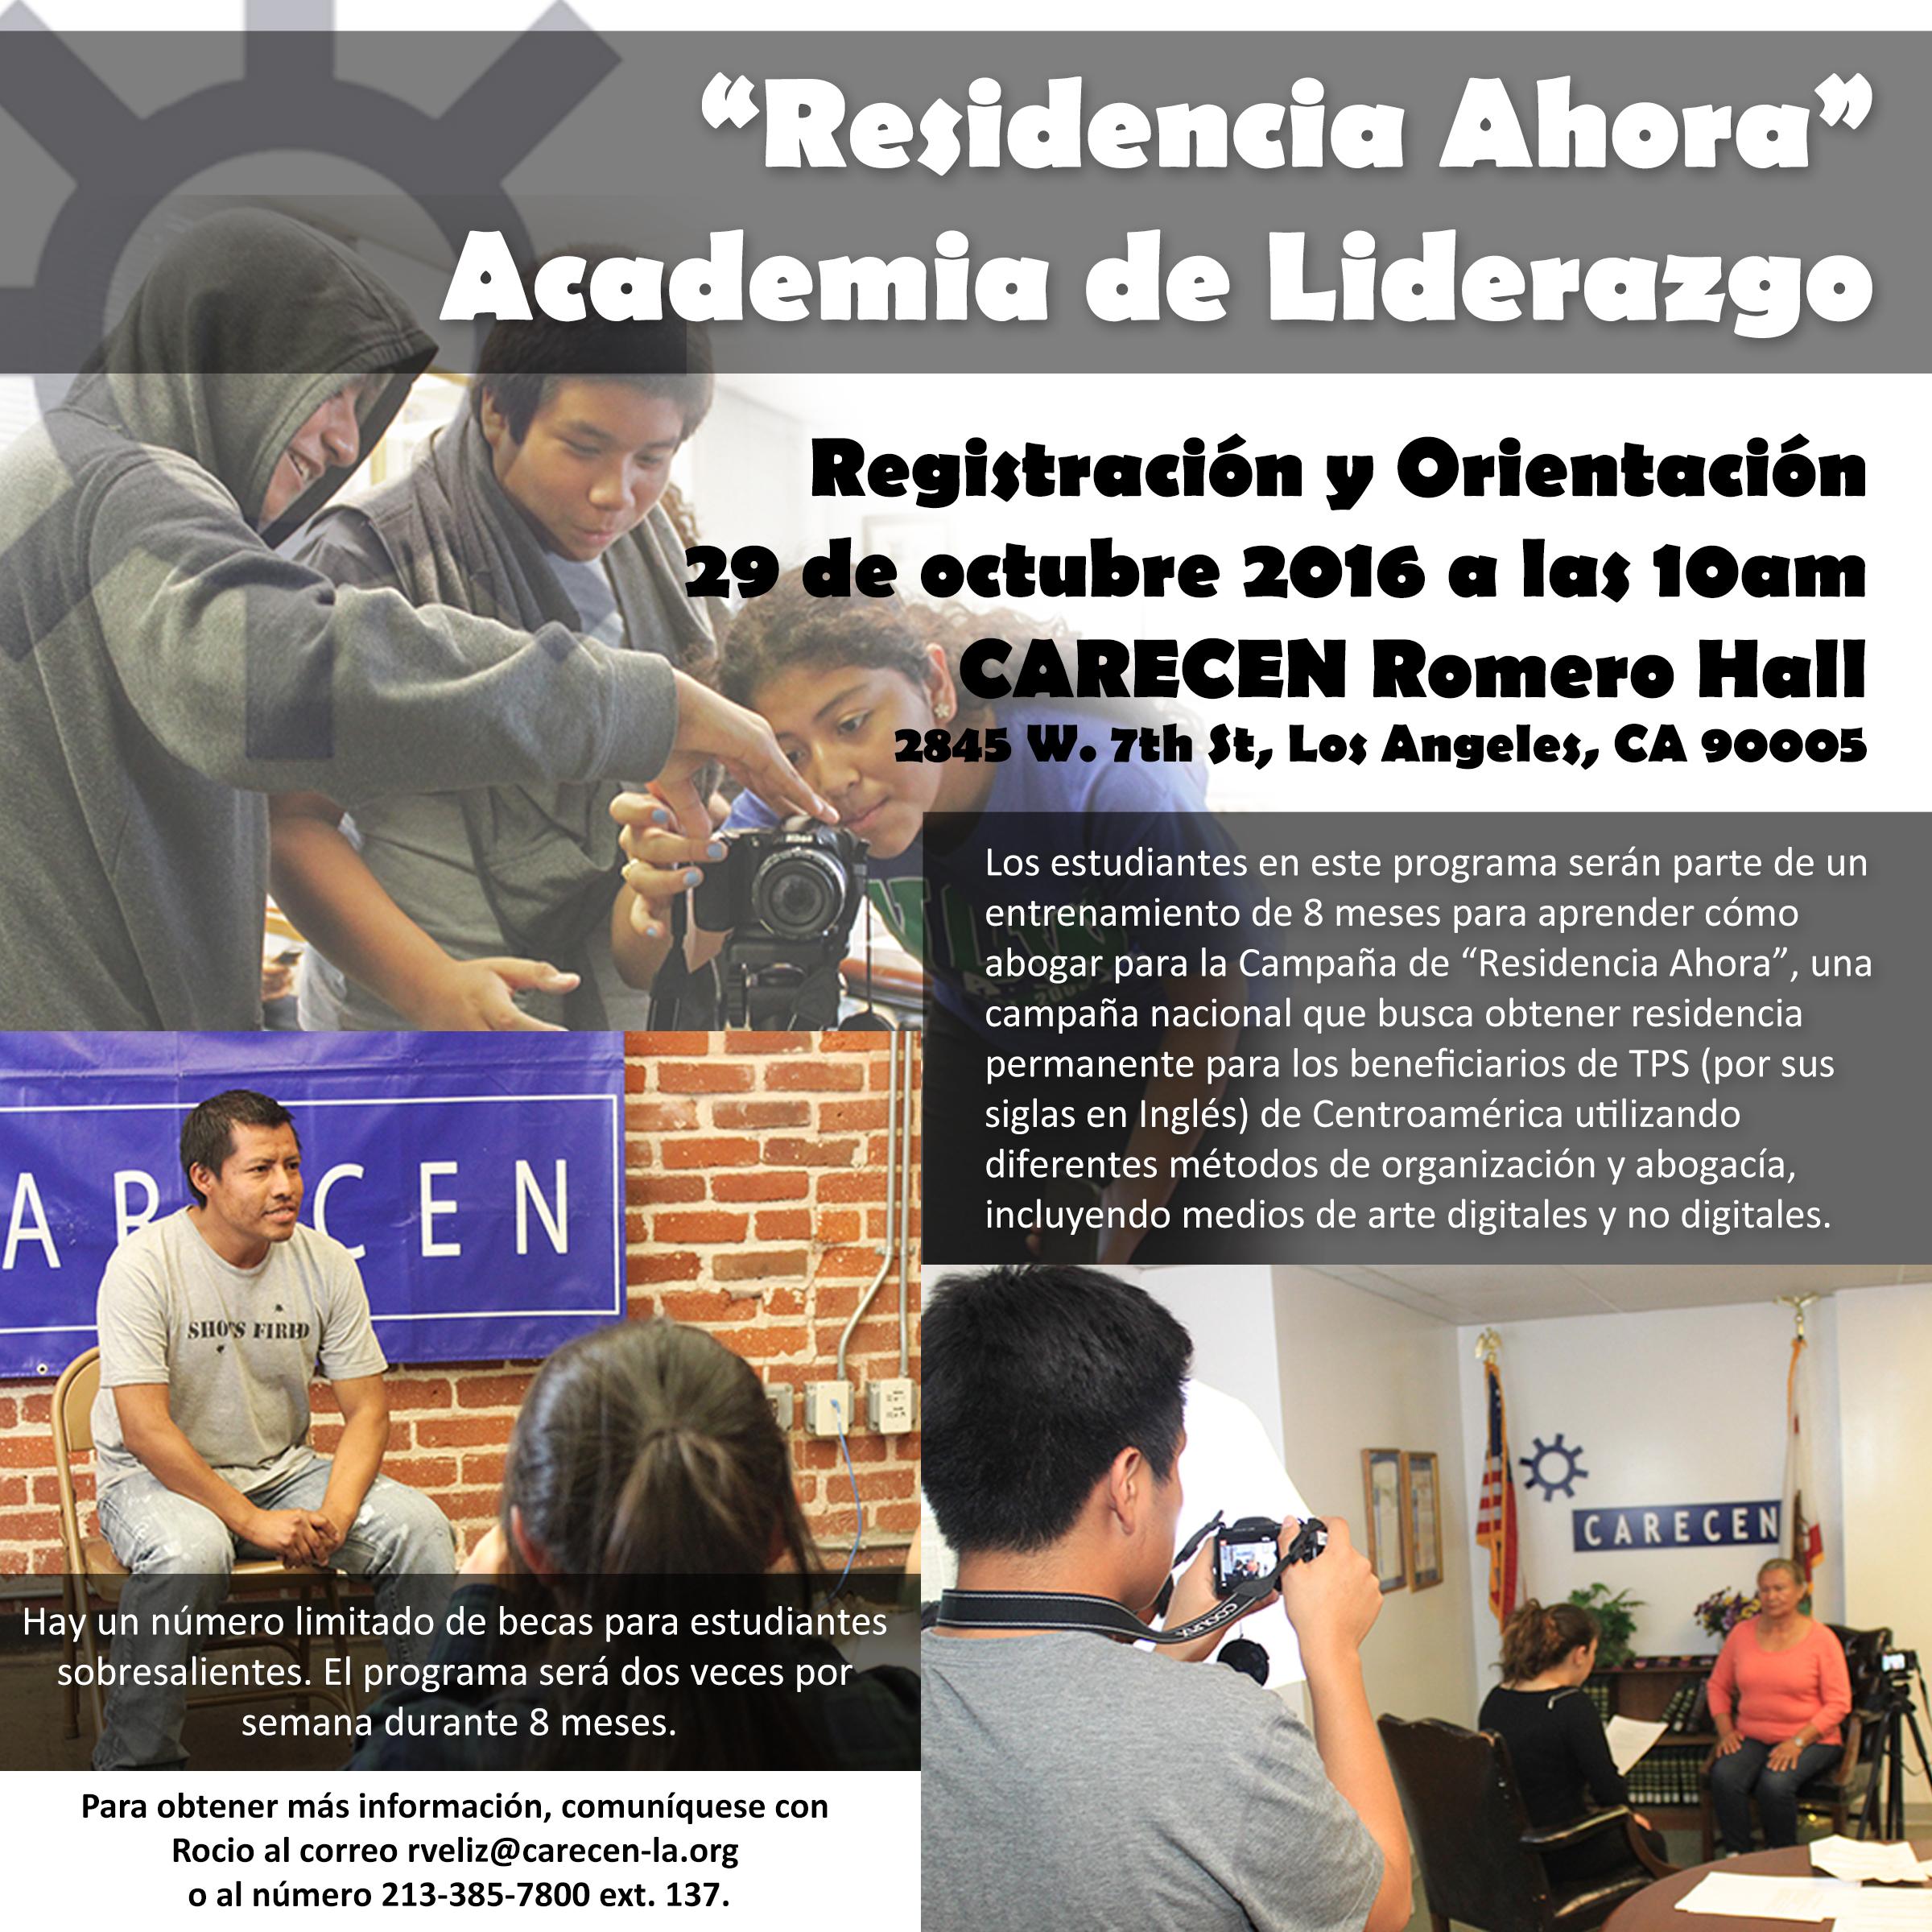 Residency_Now_Leadership_Academy_Flyer_9-2016_(Spanish)2.jpg